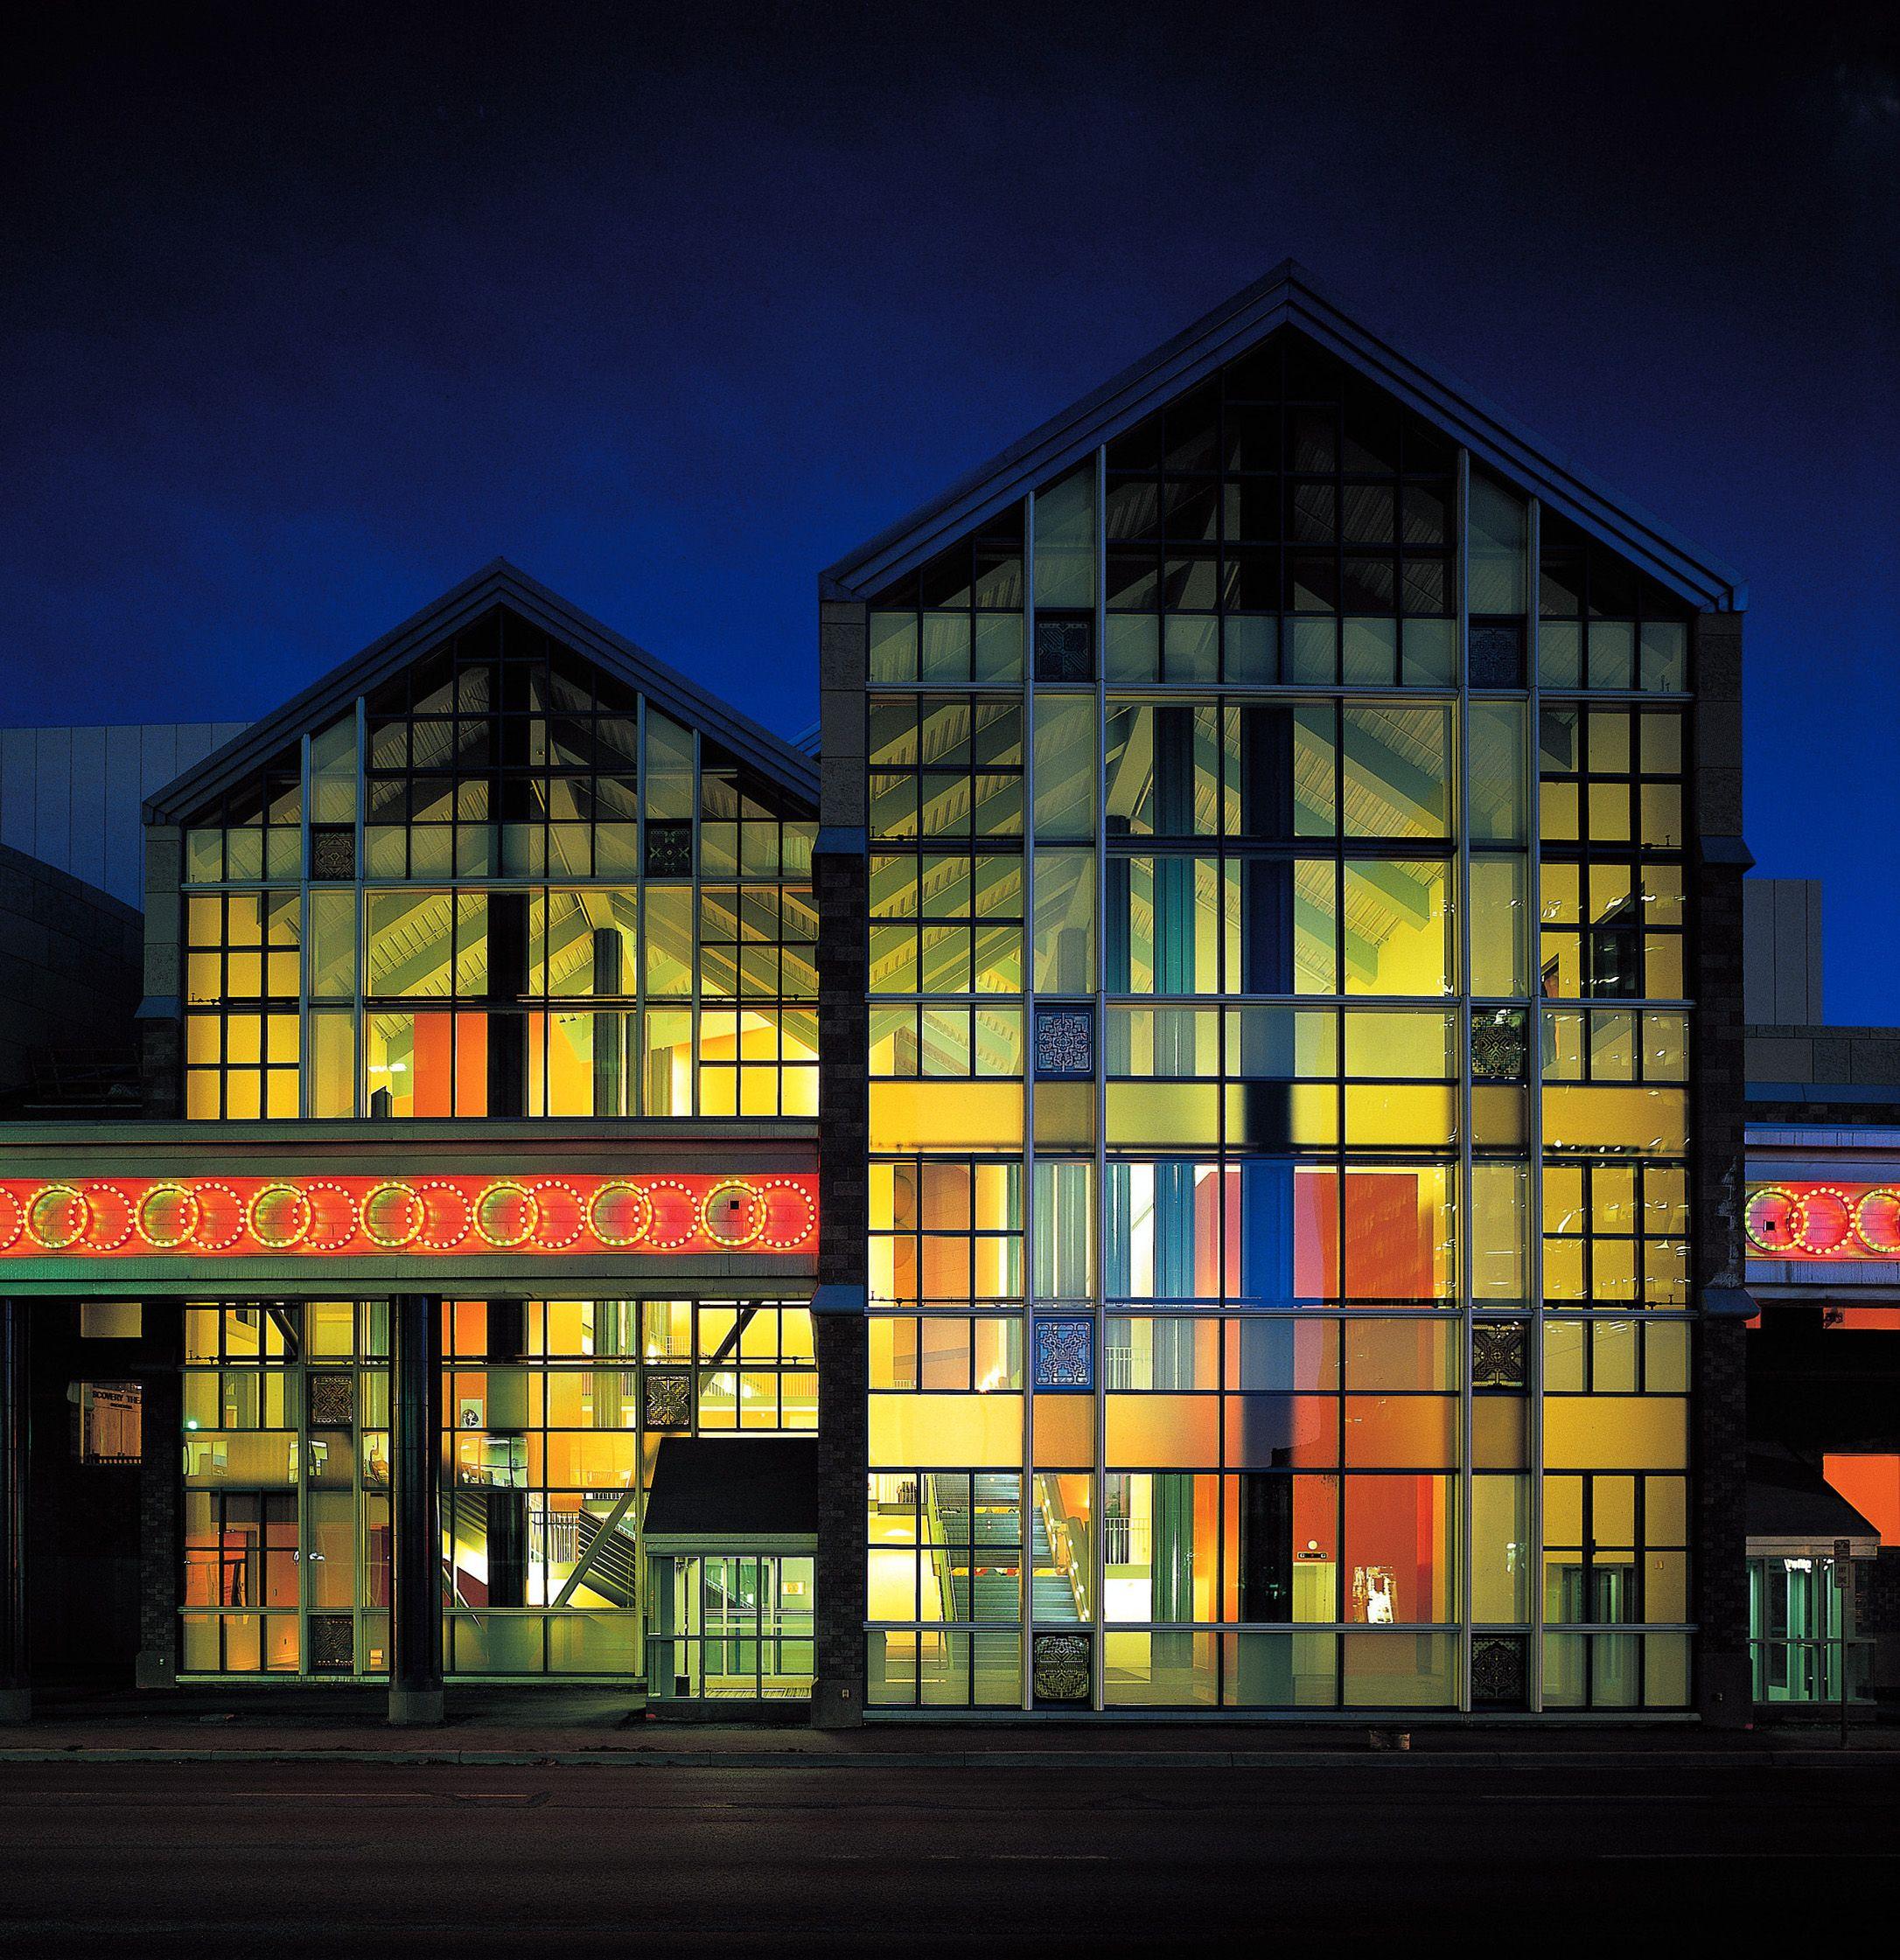 Color art anchorage - Alaska Center For The Performing Arts Anchorage Ak